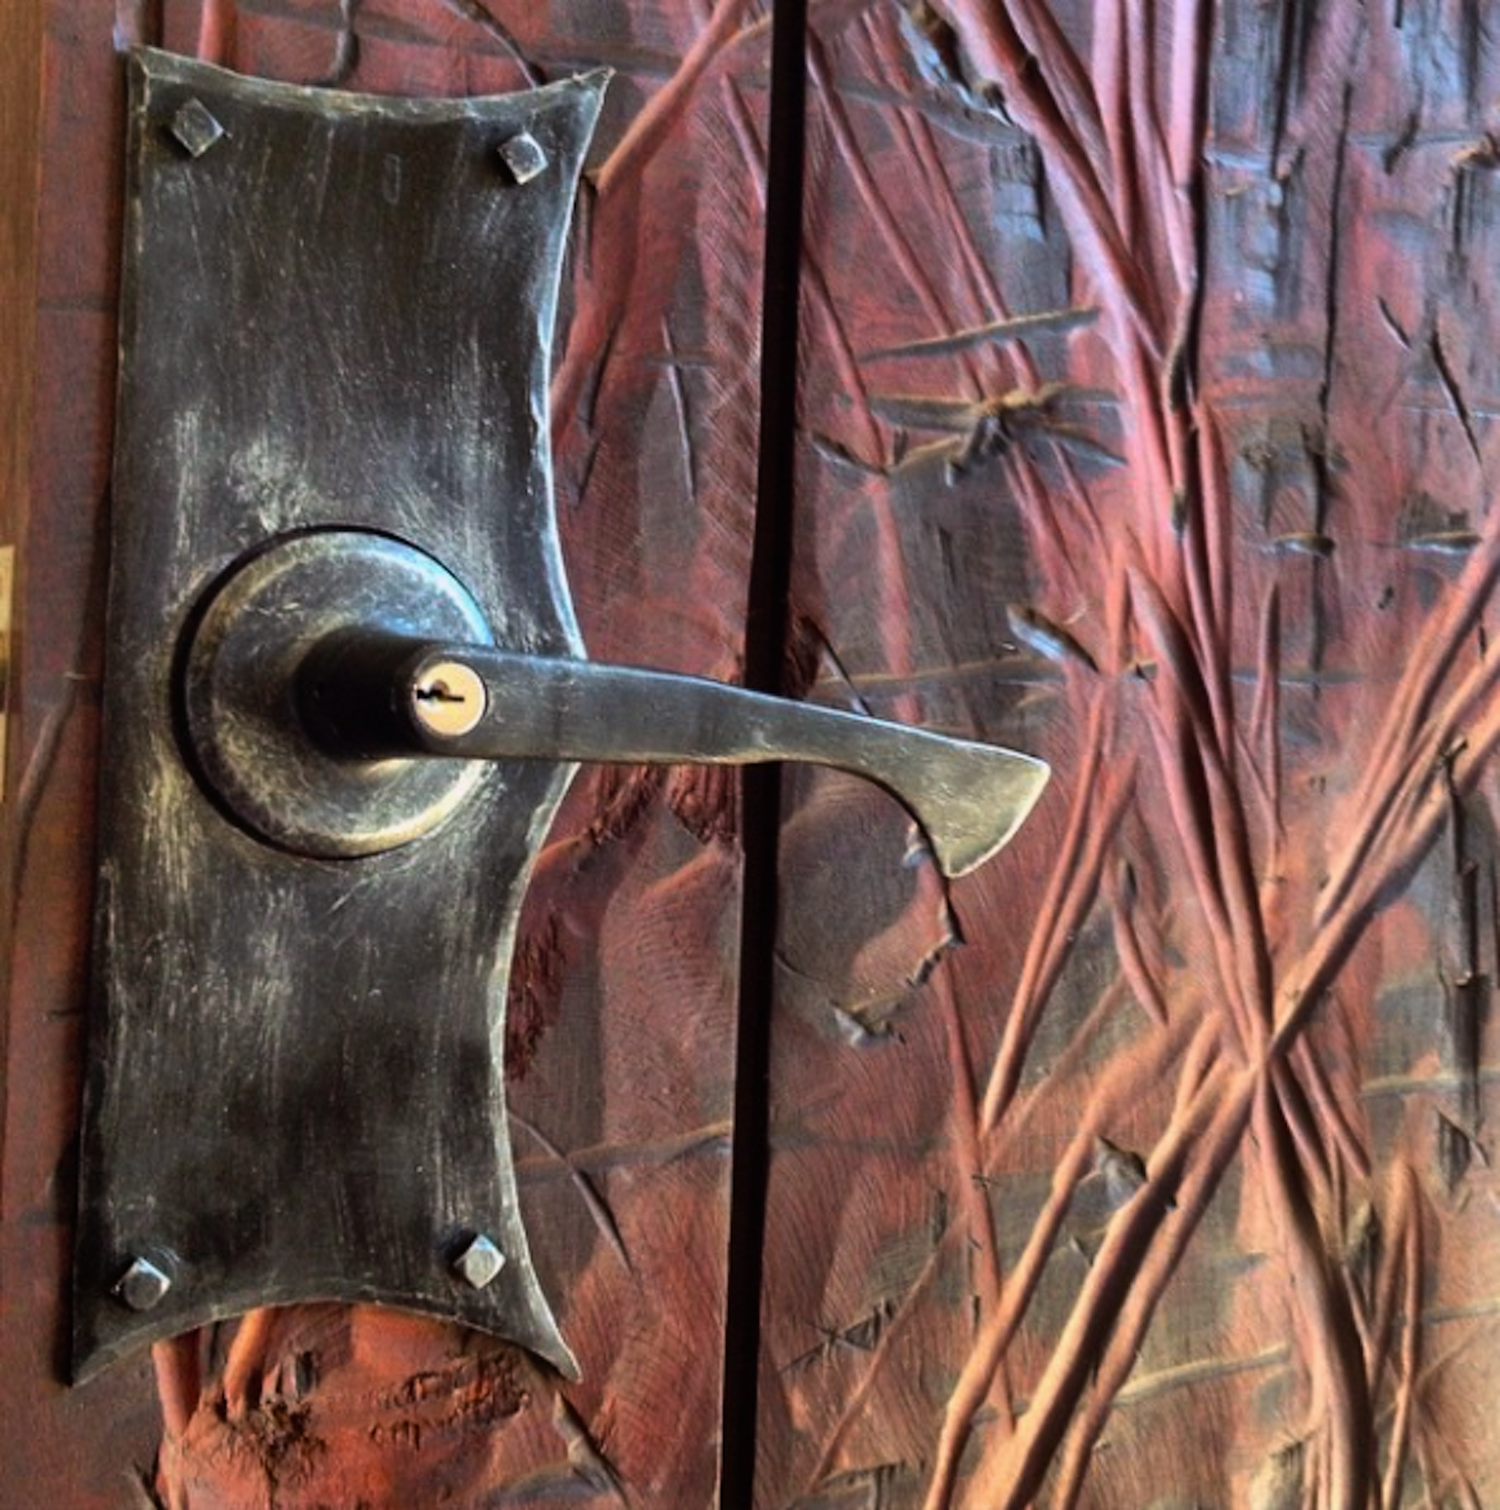 FORGED DOOR HARDWARE (lockplate)